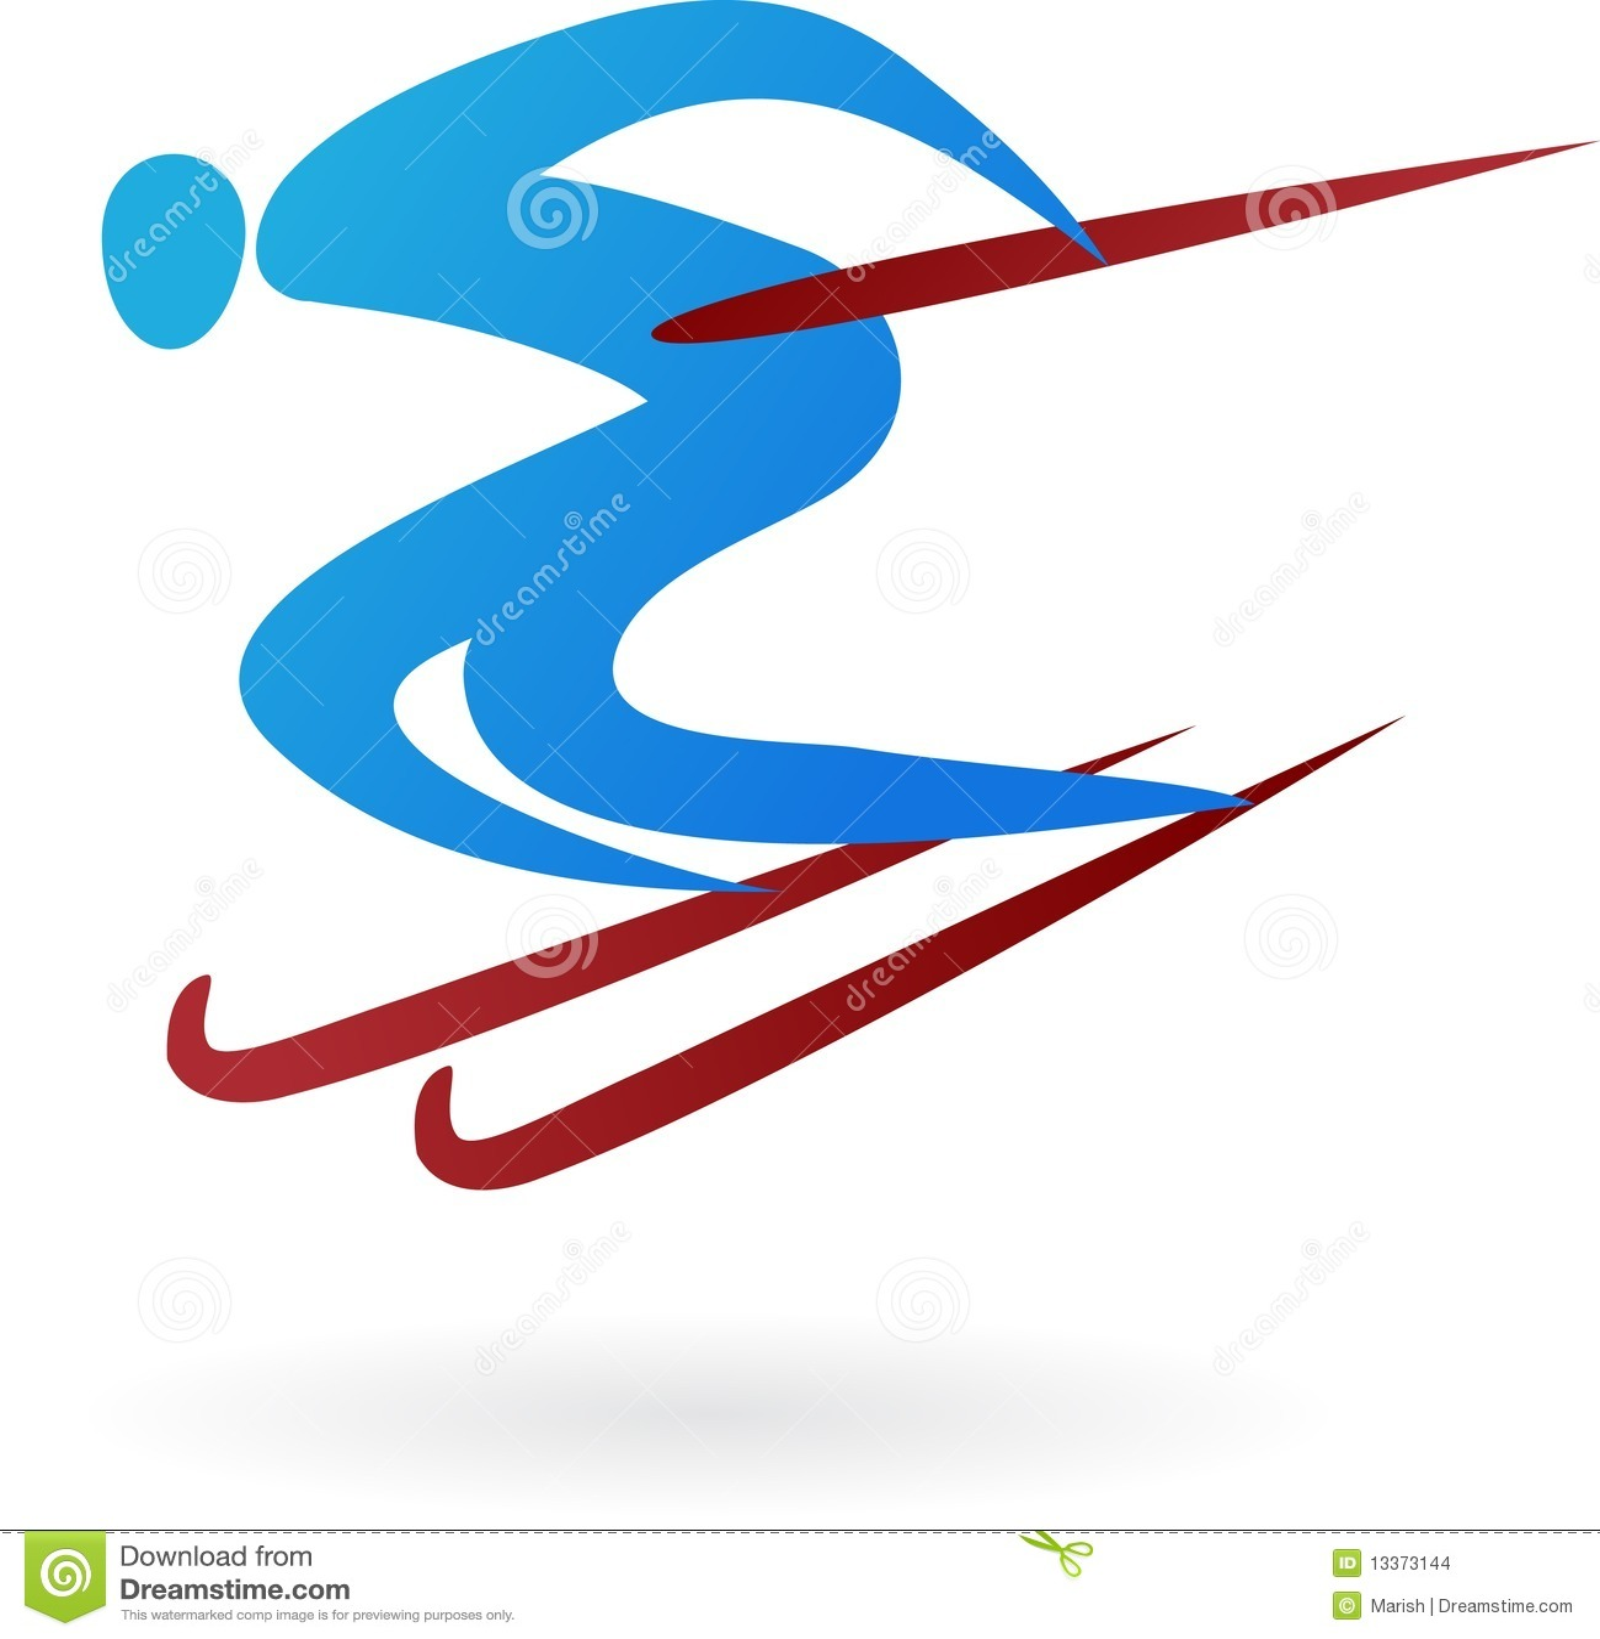 Sport Logo - Ski Stock Images - Image: 13373144